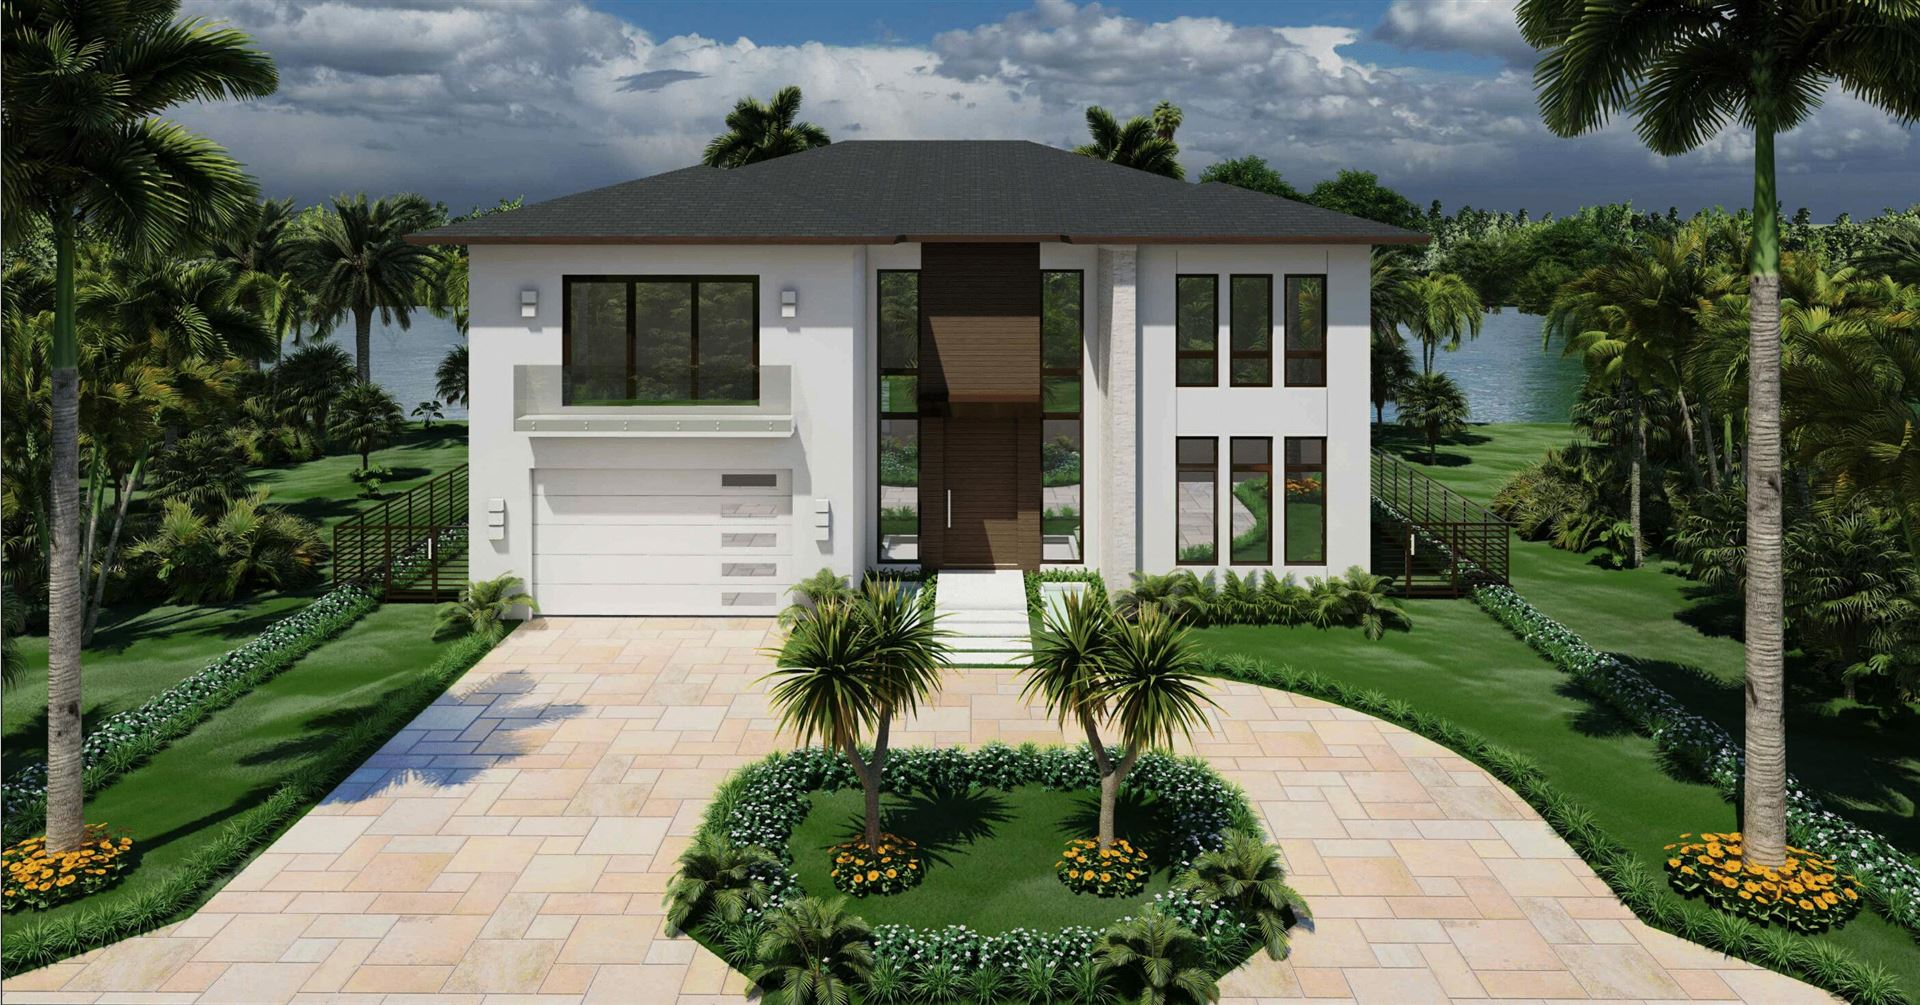 1030 Lewis Cove Road, Delray Beach, FL 33483 - MLS#: RX-10743676